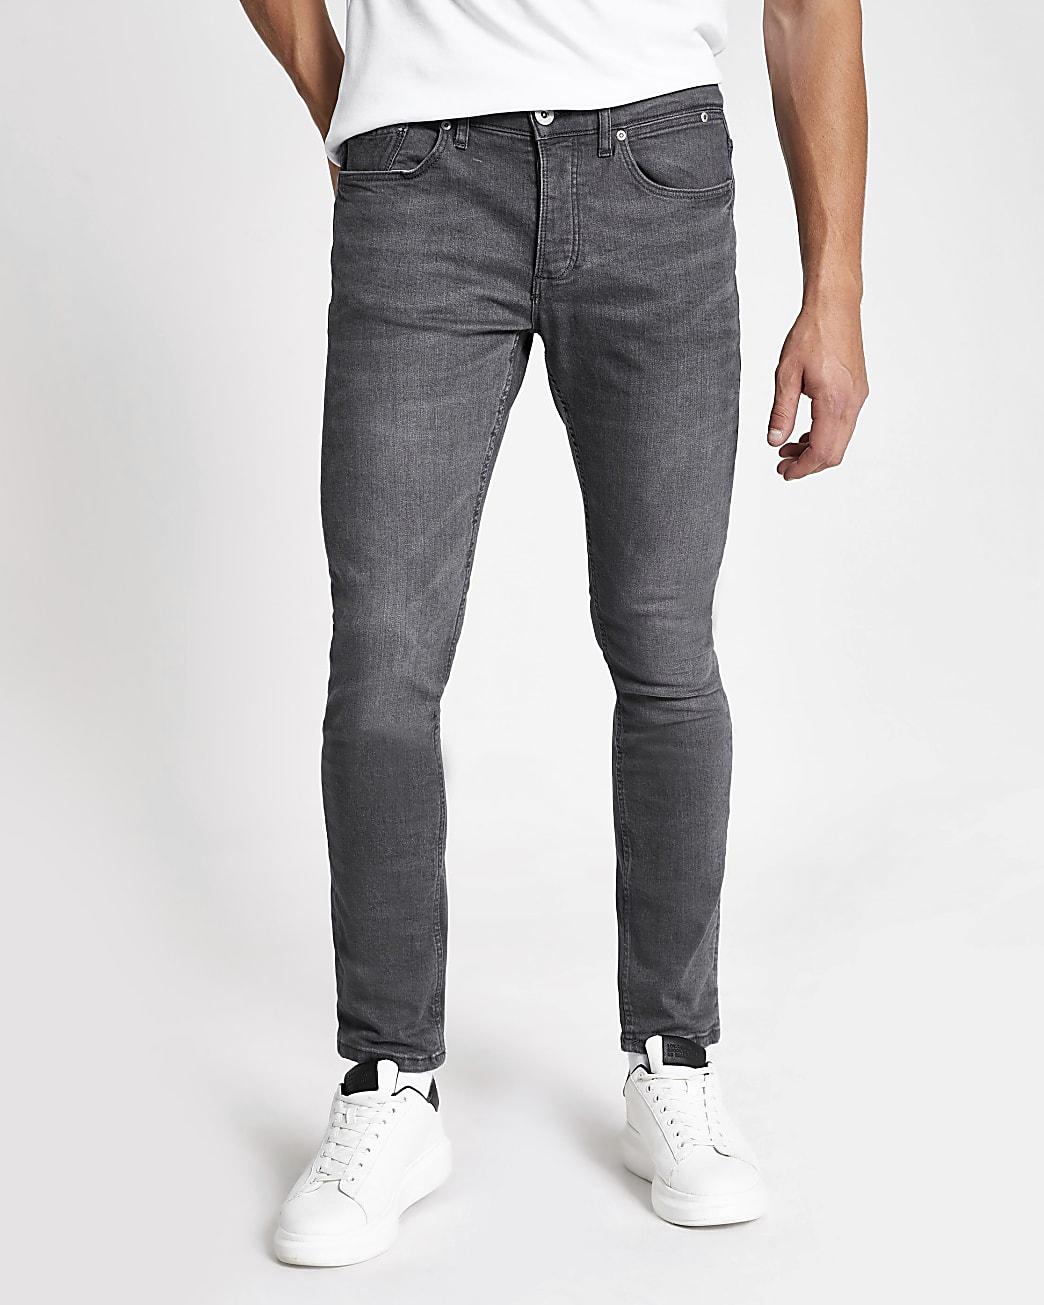 Grey skinny fit jeans